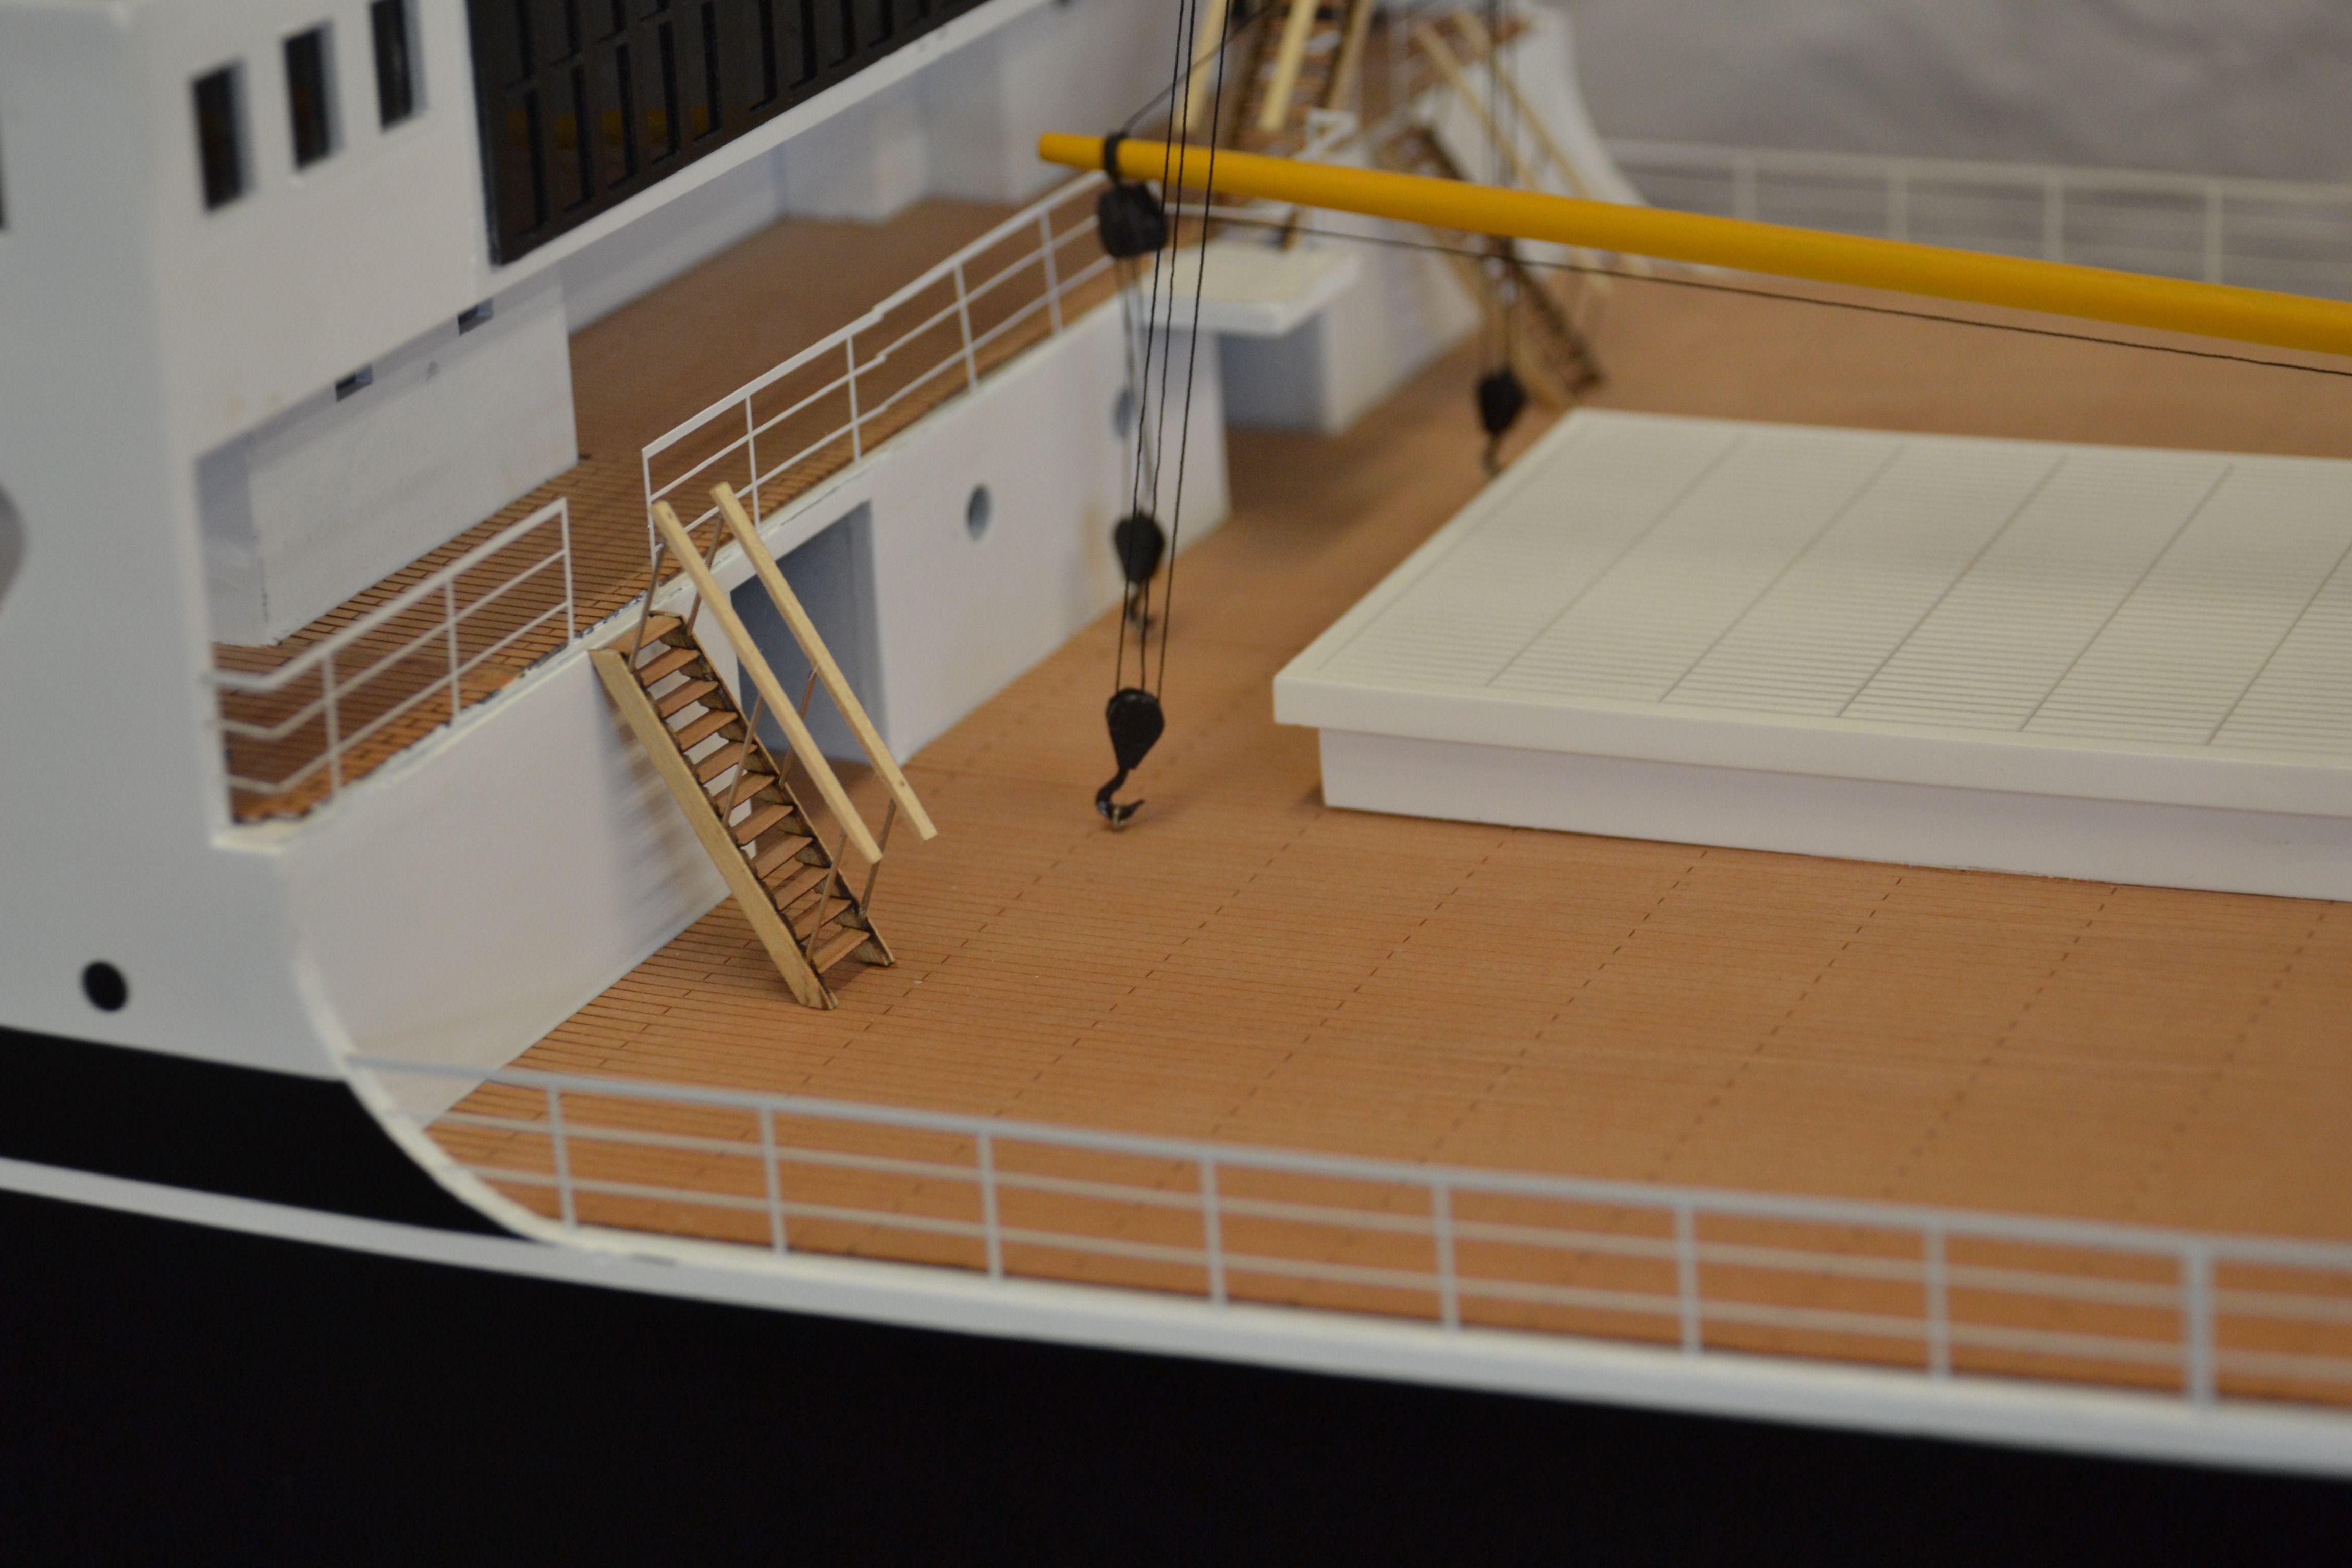 2209-12956-SS-Corinthic-Model-Ship